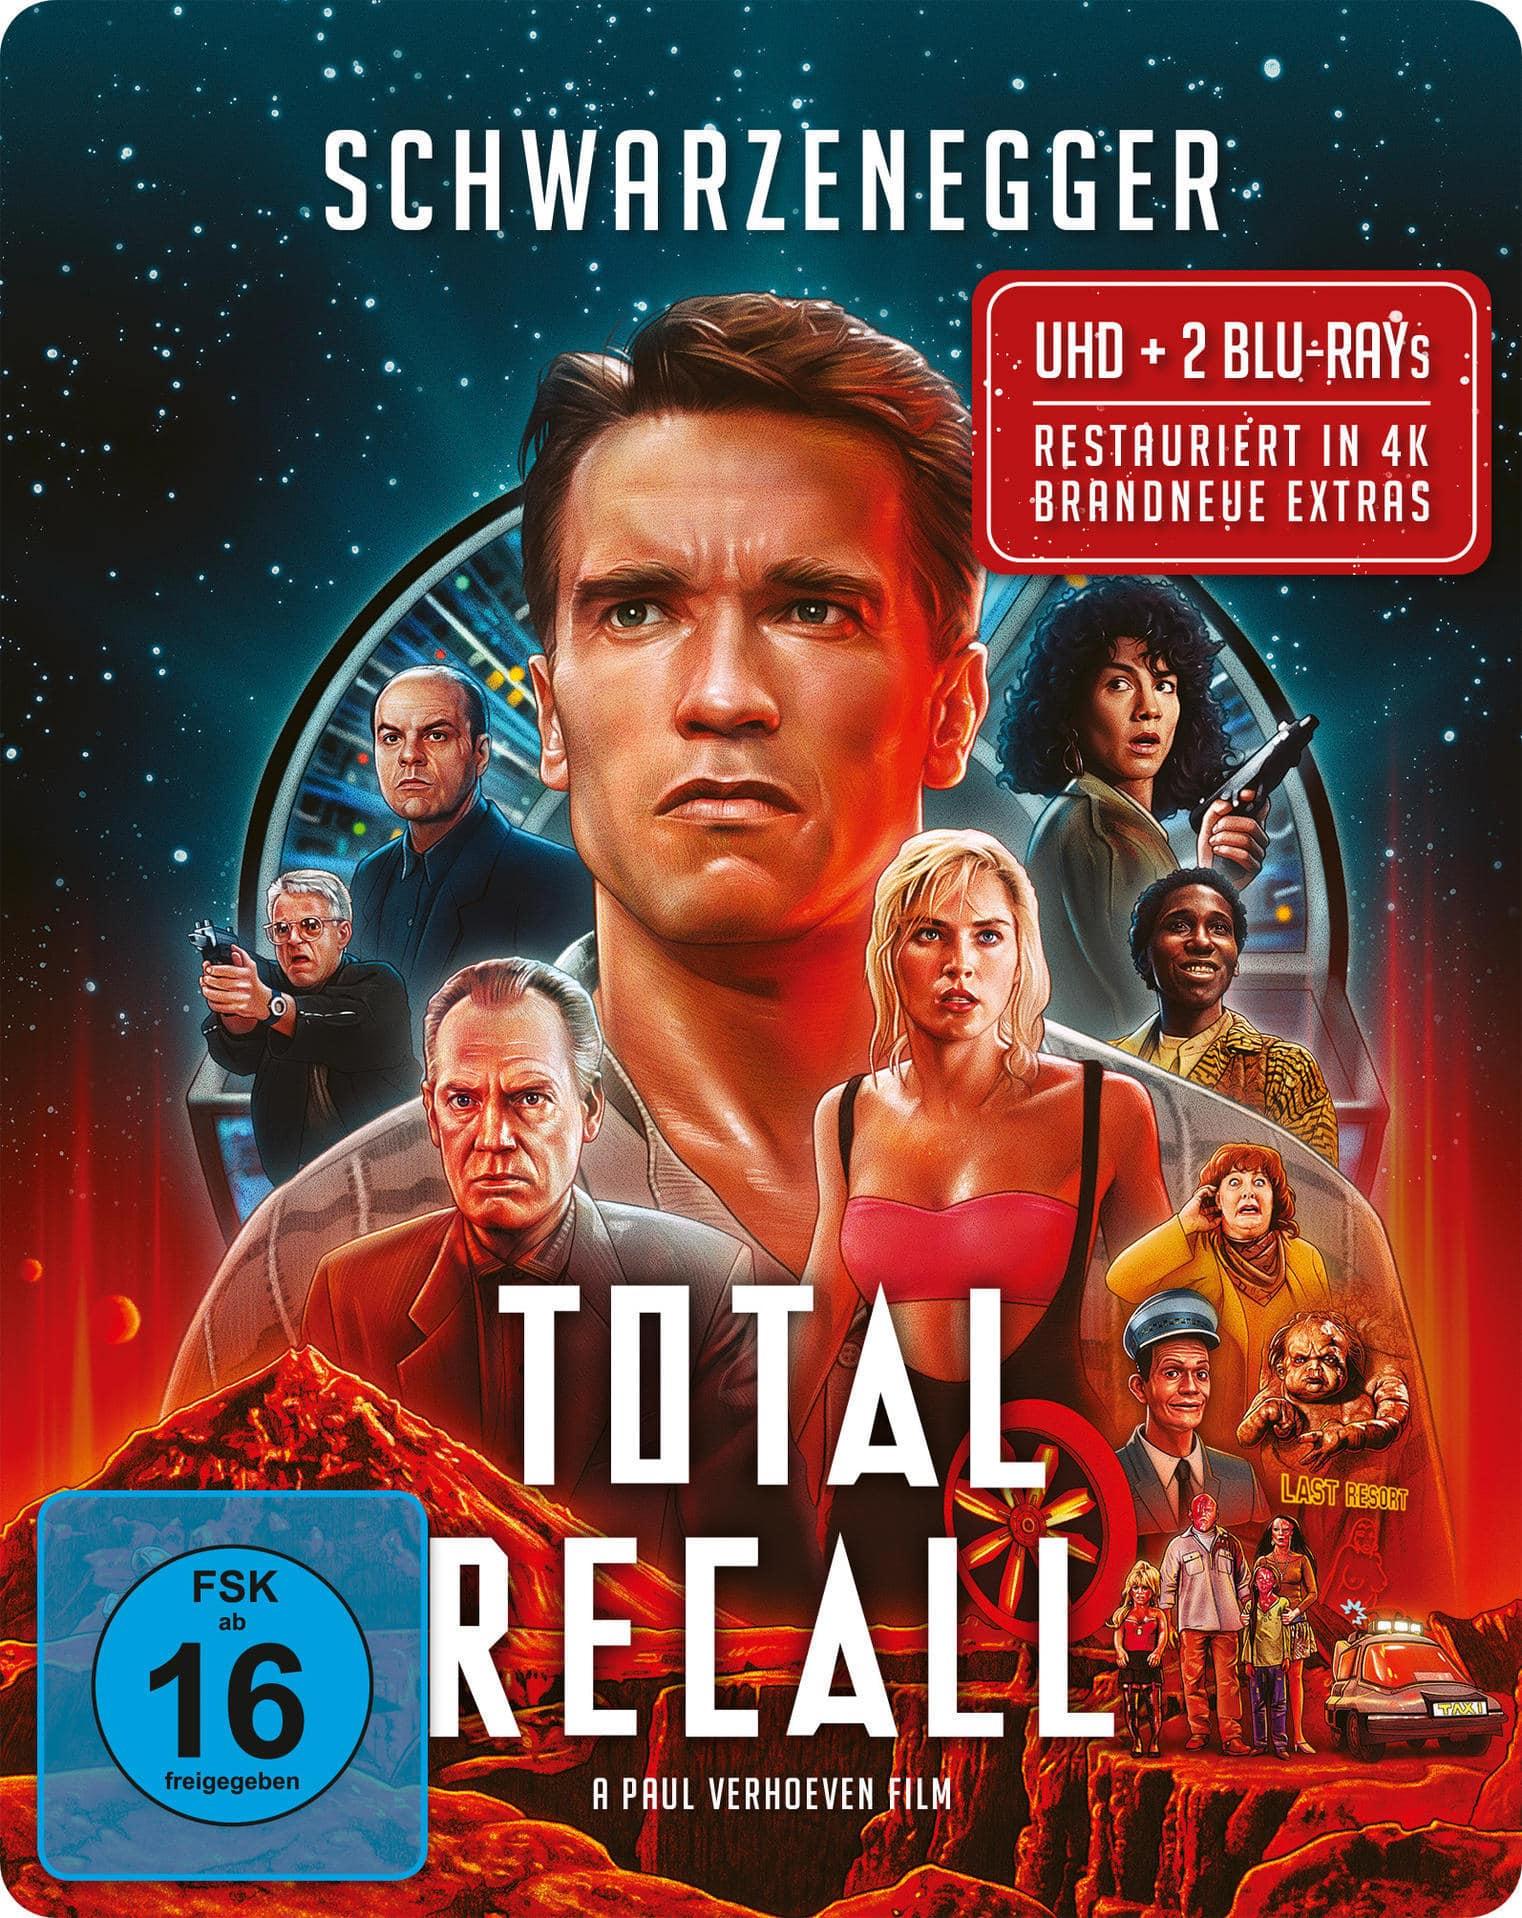 Total Recall - Die totale Erinnerung Limited Steelbook (4K Ultra HD BLU-RAY) für 34,11 Euro